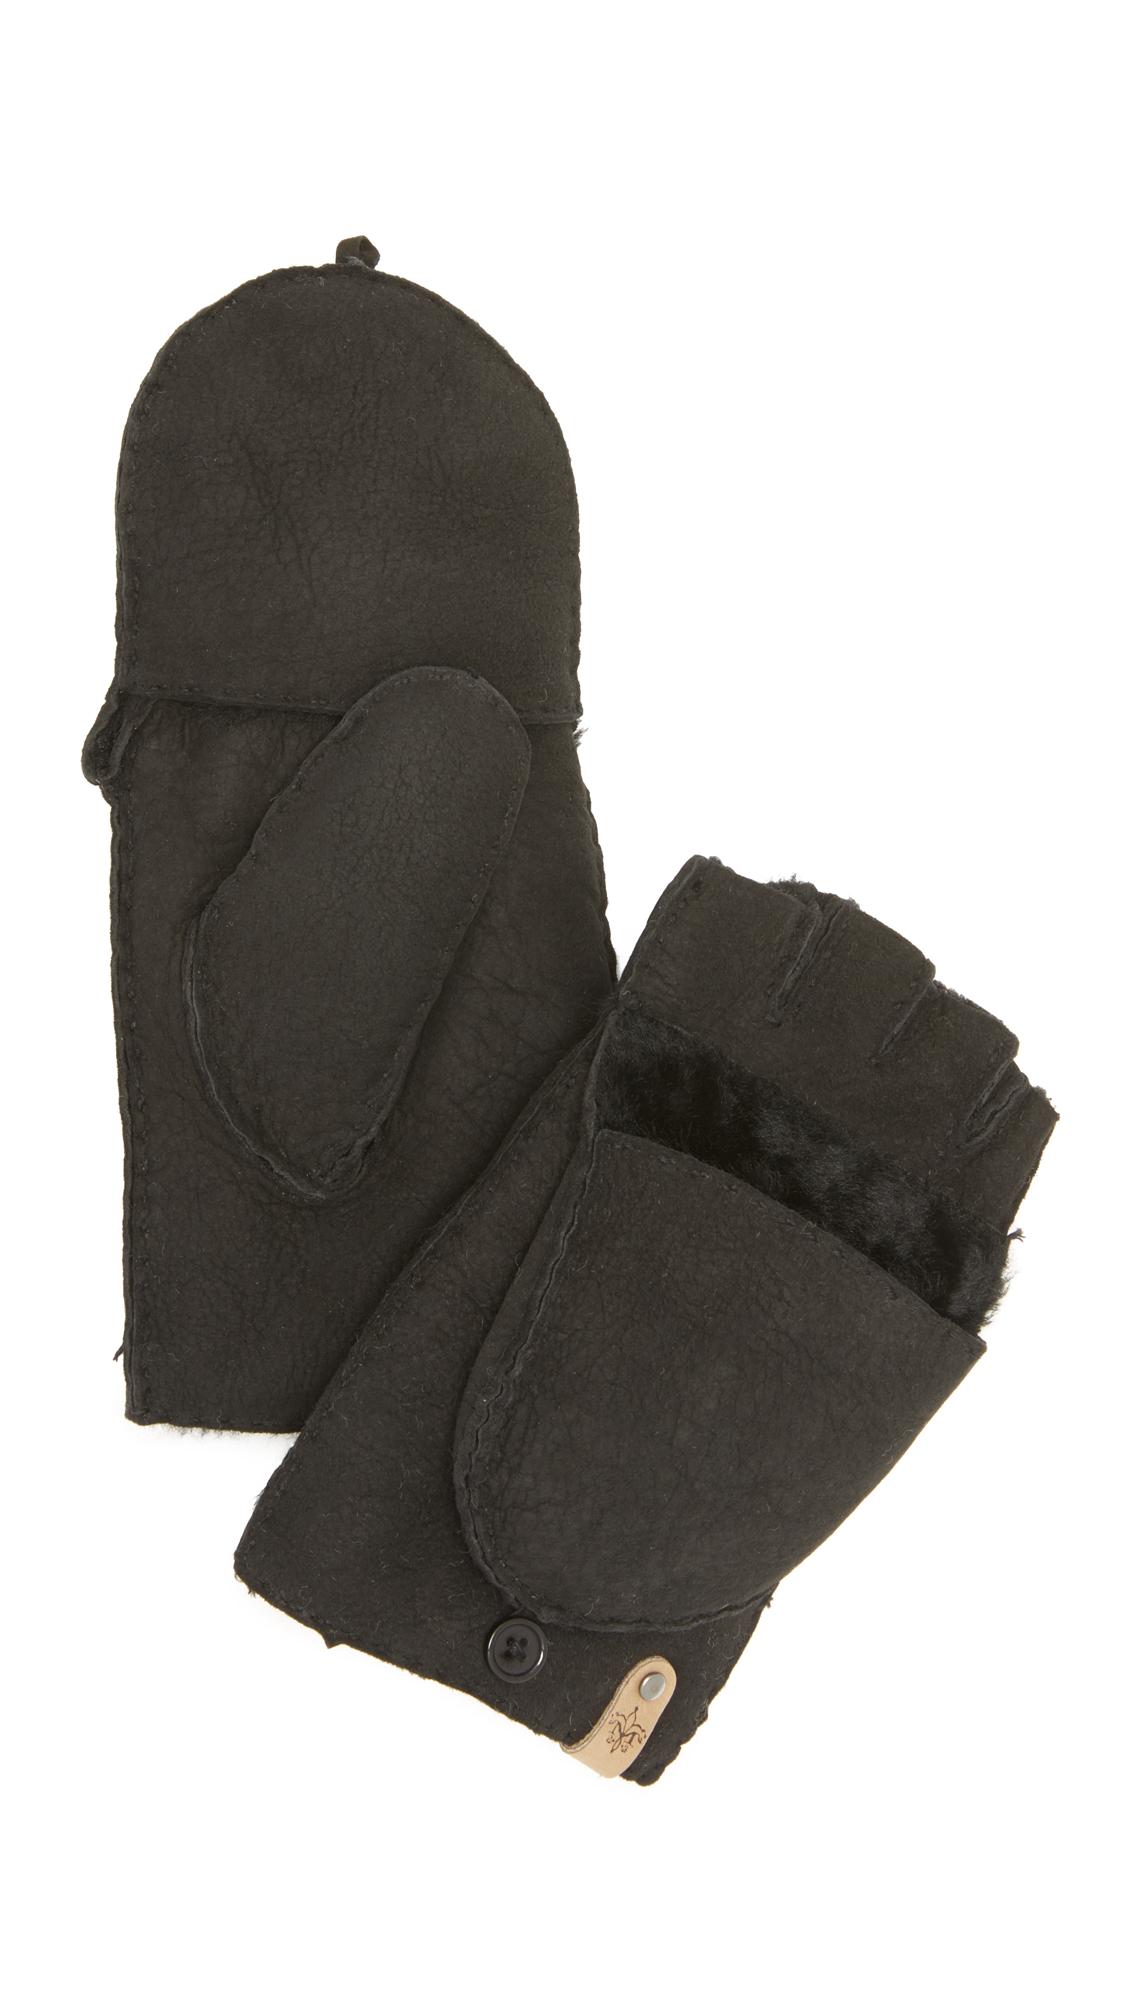 Mackage Orea Texting Gloves - Black at Shopbop